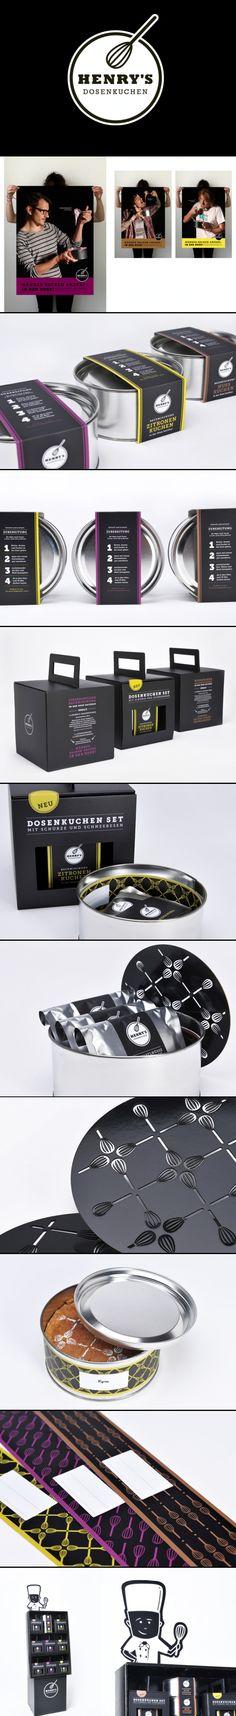 Henry's Dosenkuchen | Anna Weist tasty #packaging #branding PD Any man can bake : )